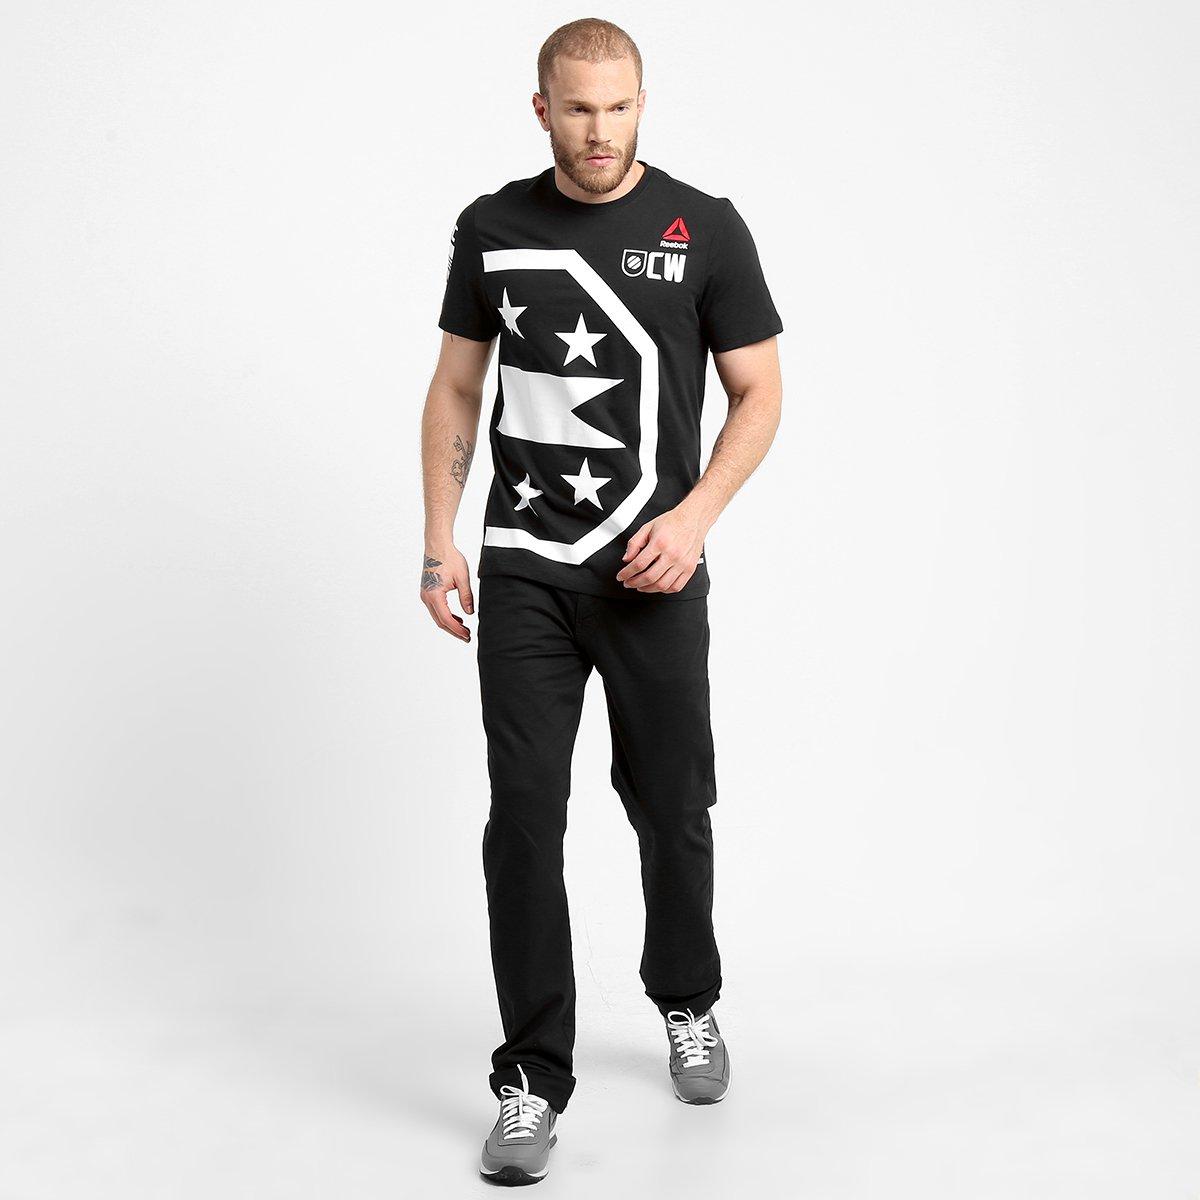 06617ce498 Camiseta Masculina UFC Reebok Icon Weidman - Compre Agora